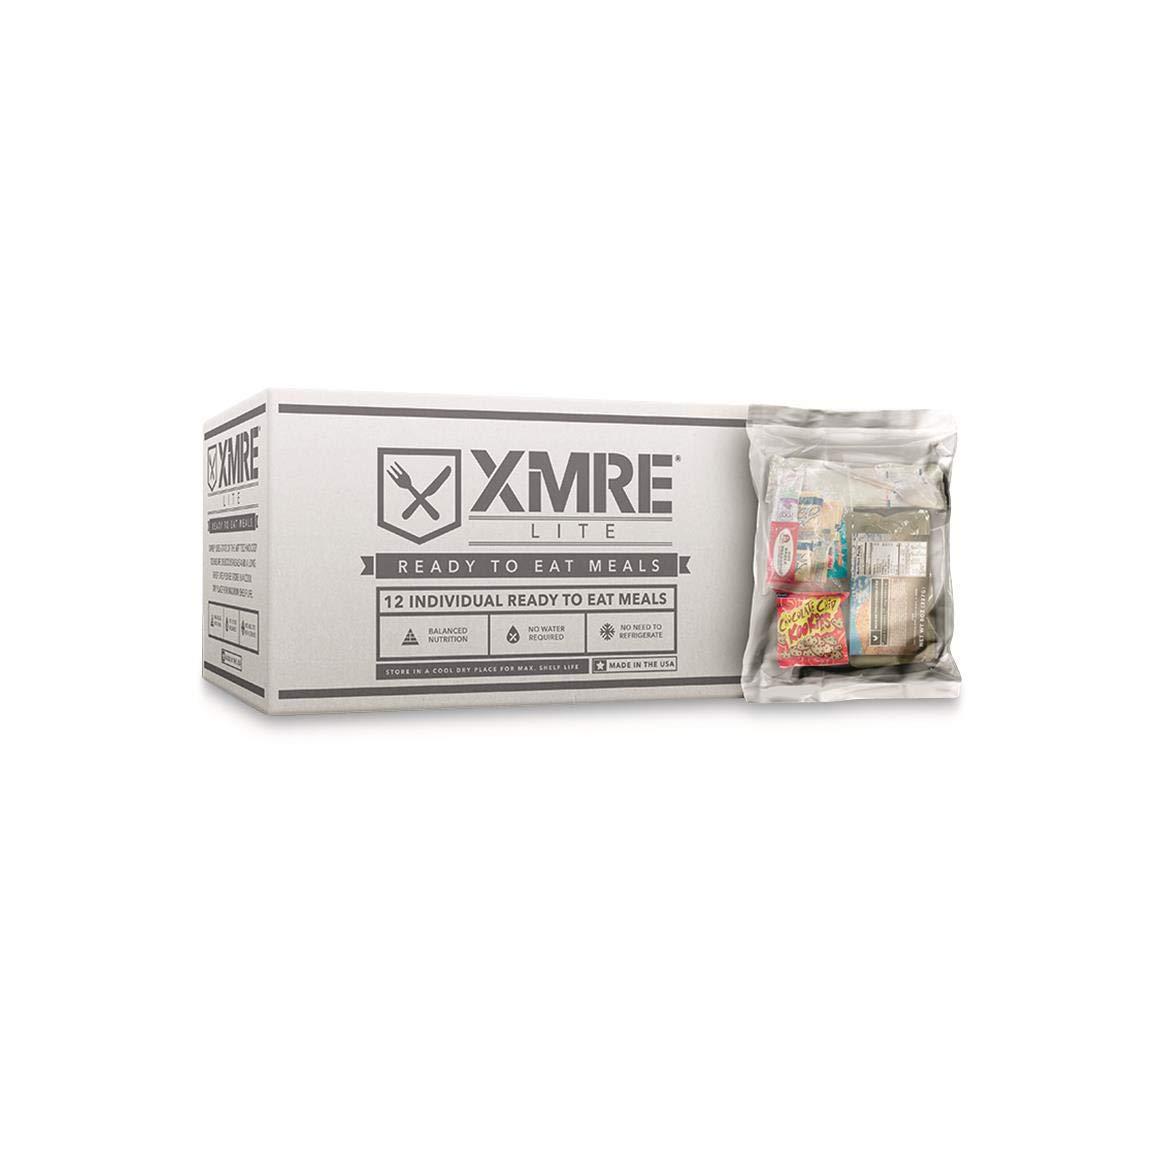 XMRE LITE MRE Food Supply, 12 Meals